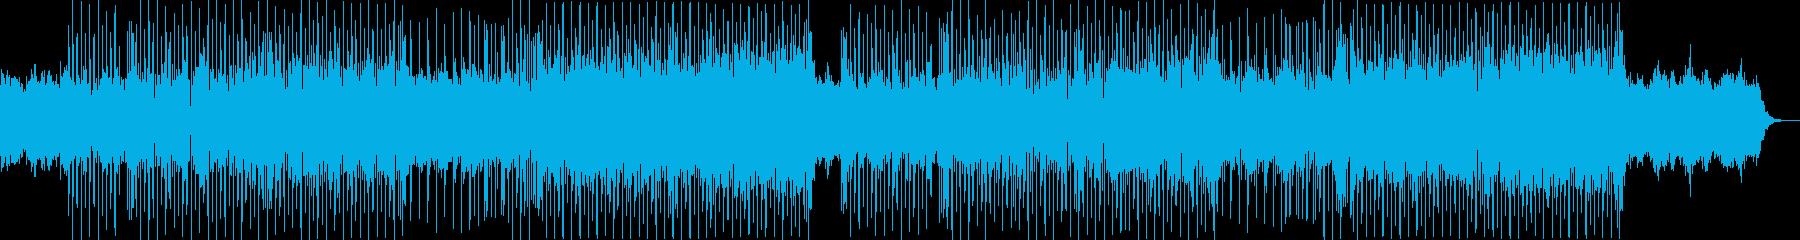 Funk、おしゃれ、シティポップ aの再生済みの波形